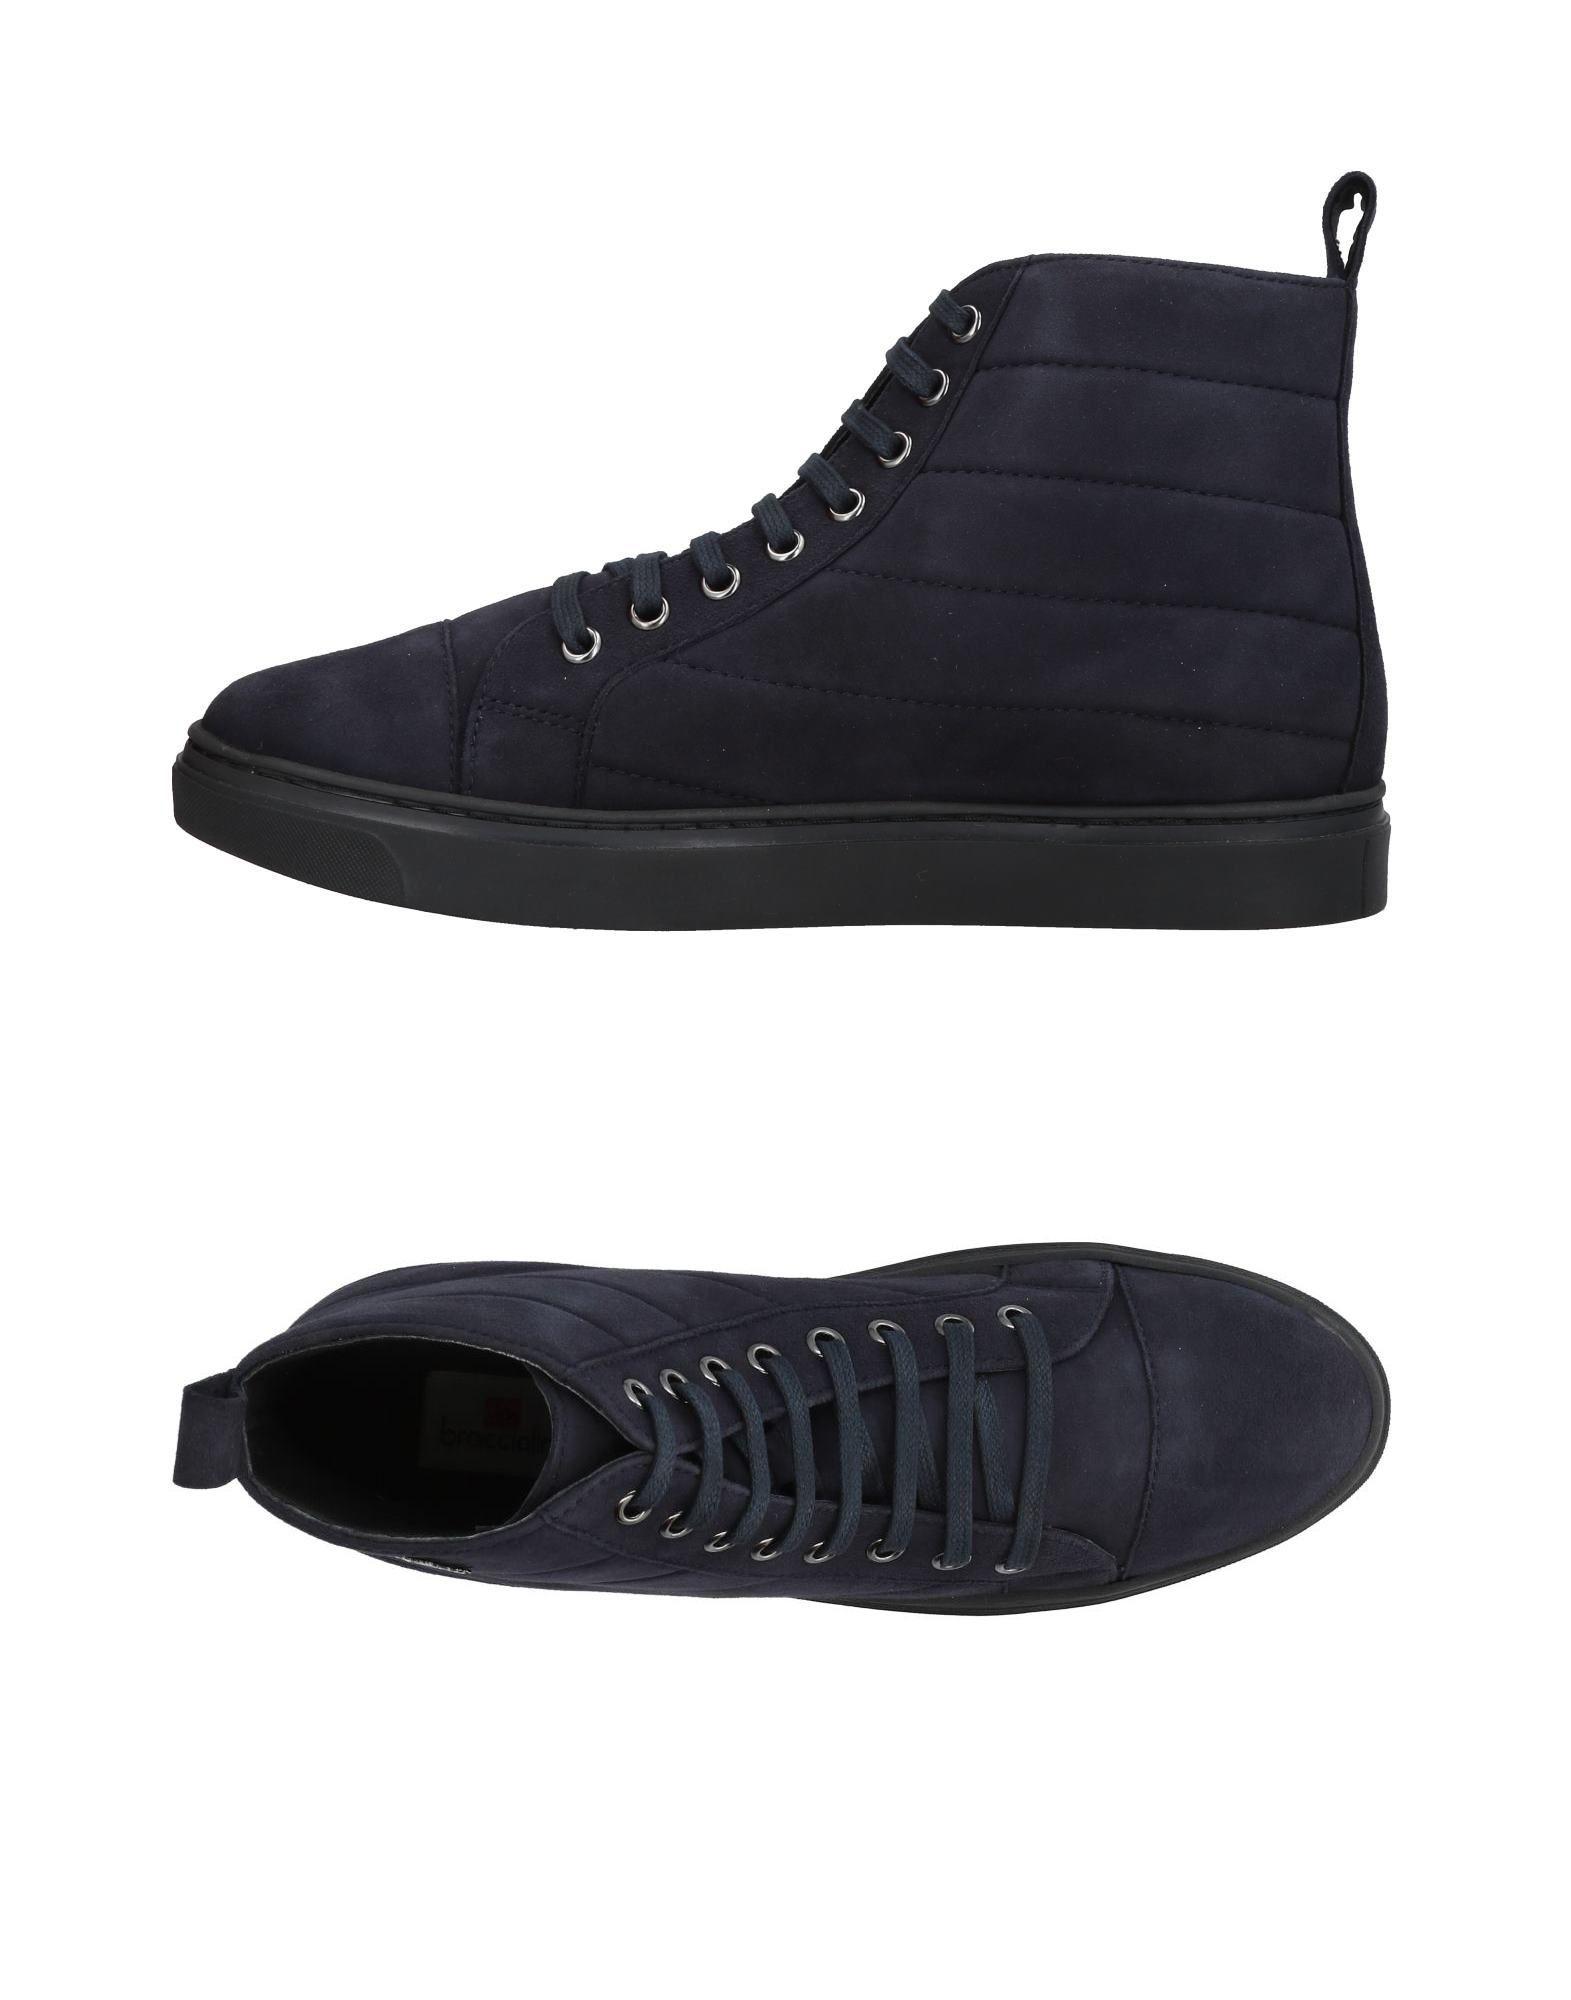 TUA BY BRACCIALINI Высокие кеды и кроссовки am pm by bottega backdoor высокие кеды и кроссовки